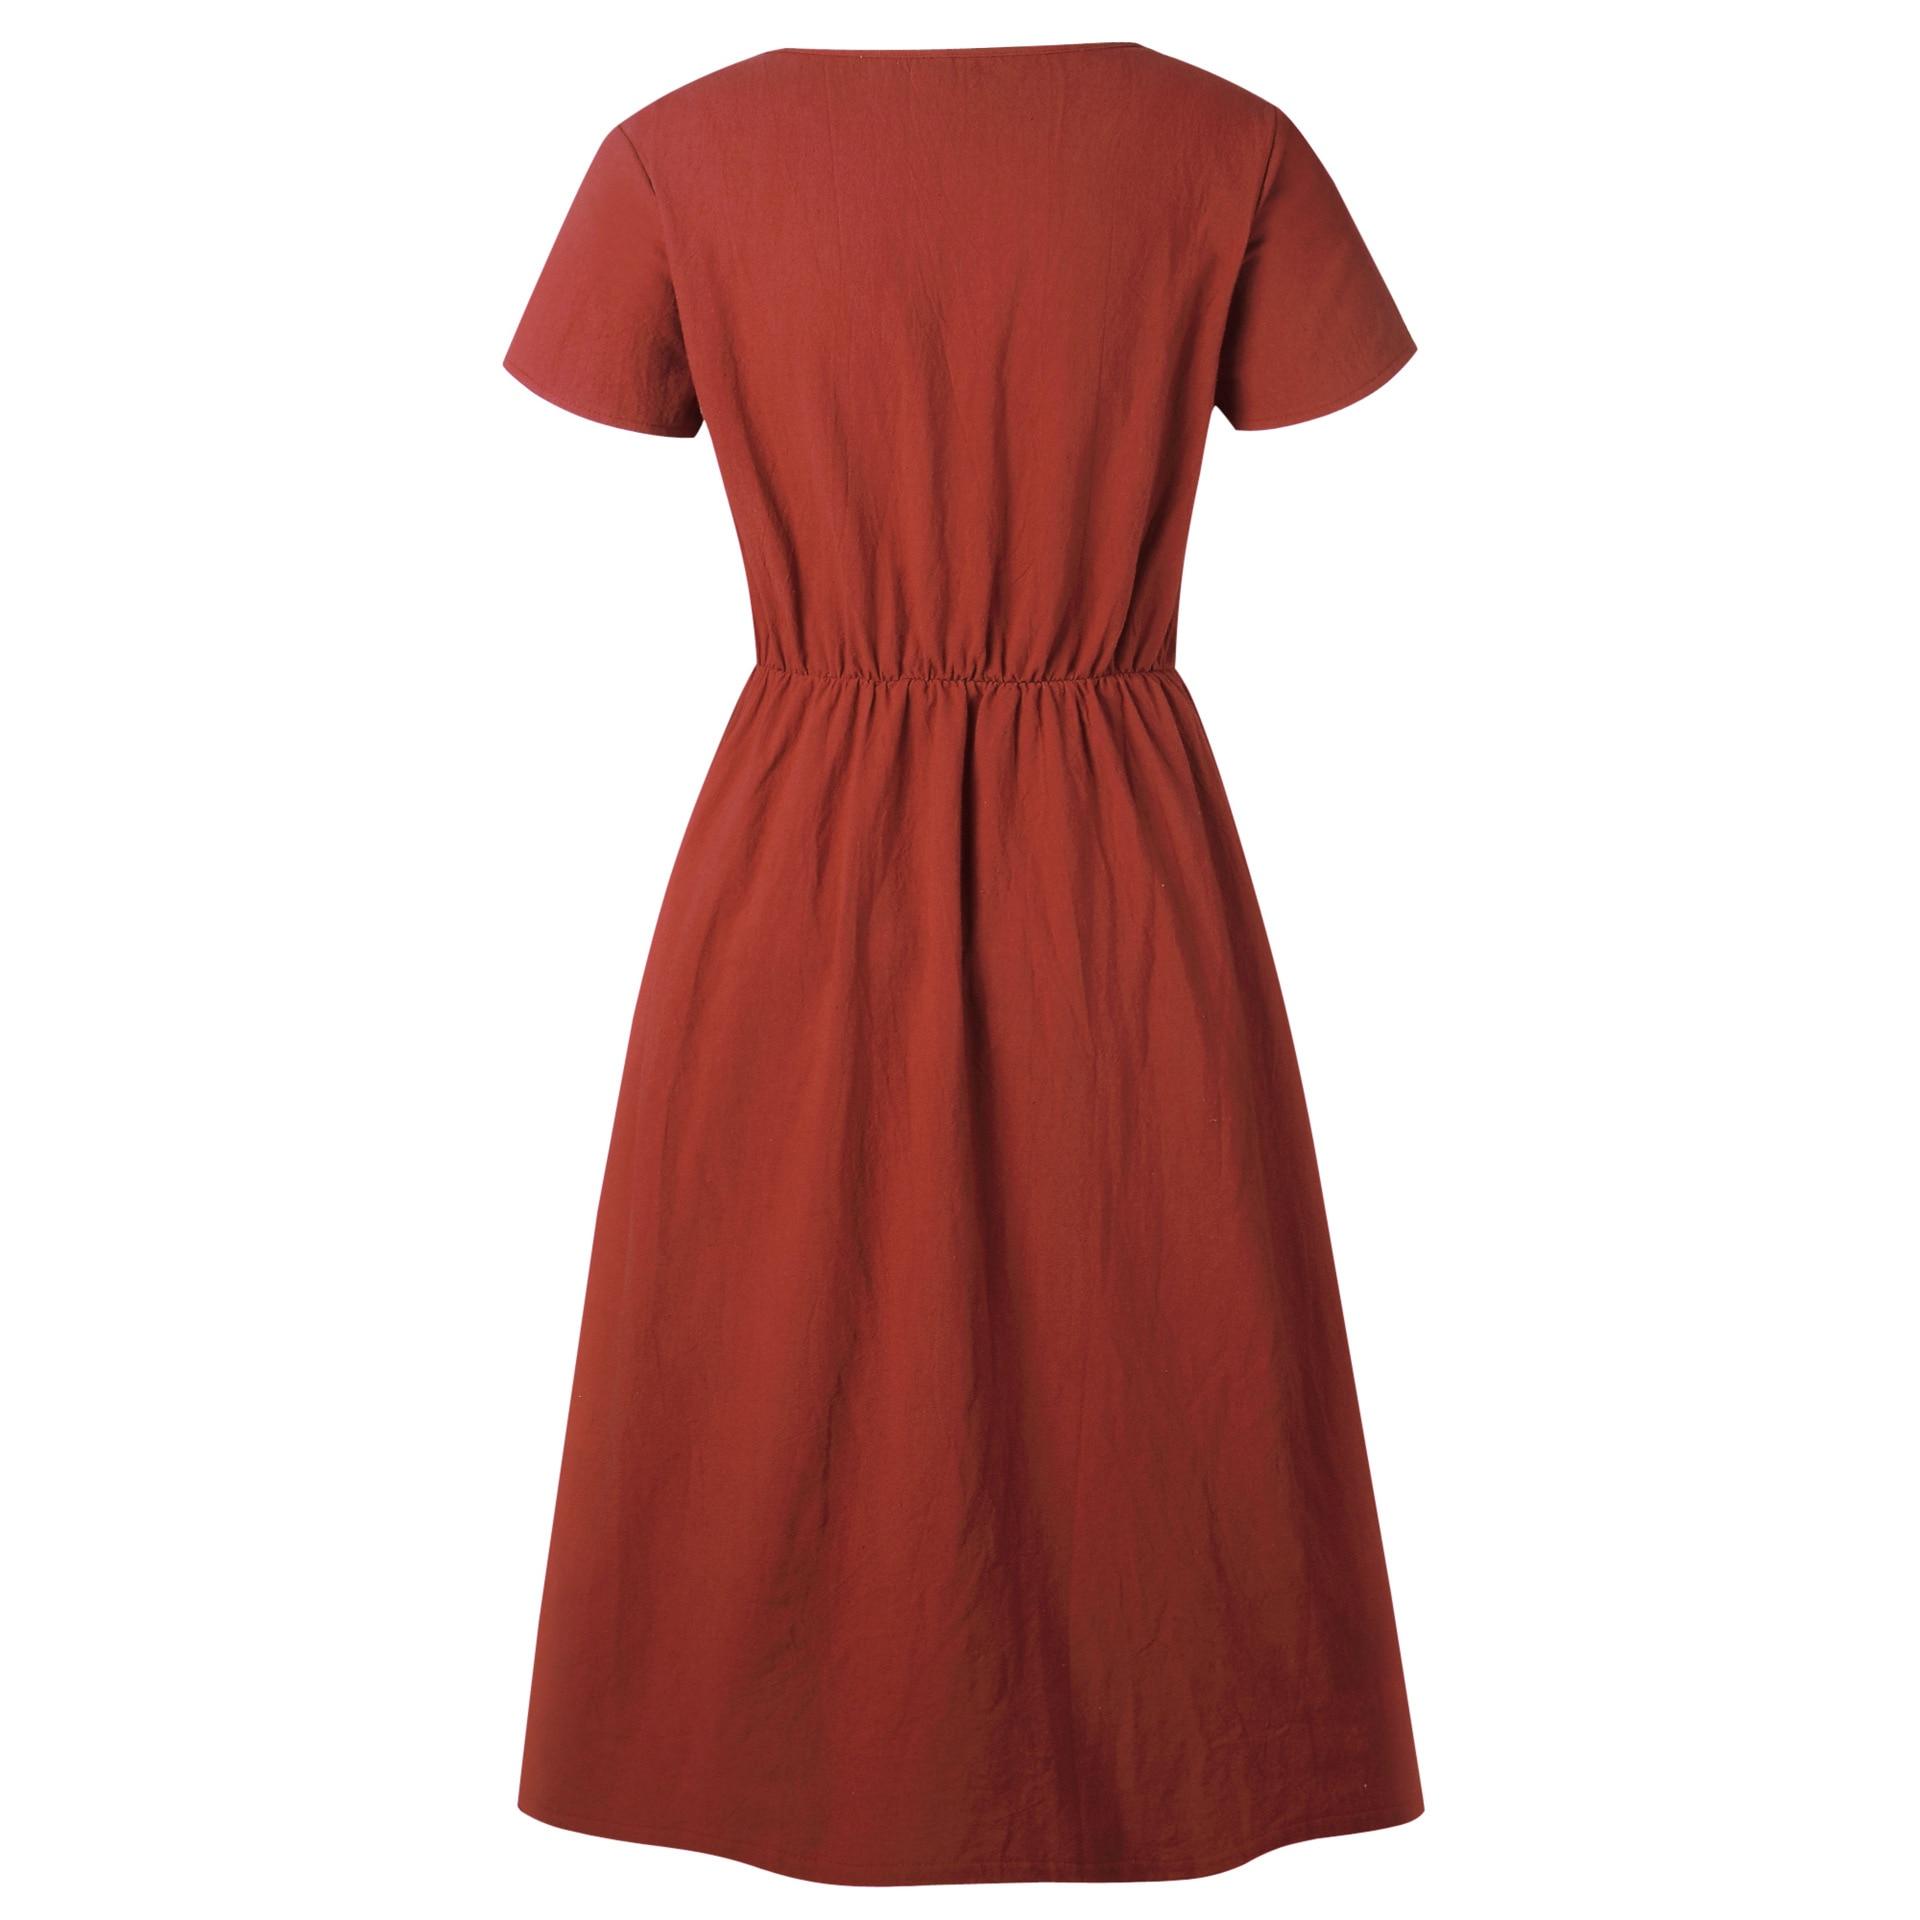 Red Blue A Line Casual Dresses Women Autumn Dress 19 Vintage Long Sleeve Dress For Ladies Buttons V Neck Midi Vestidos Female 107